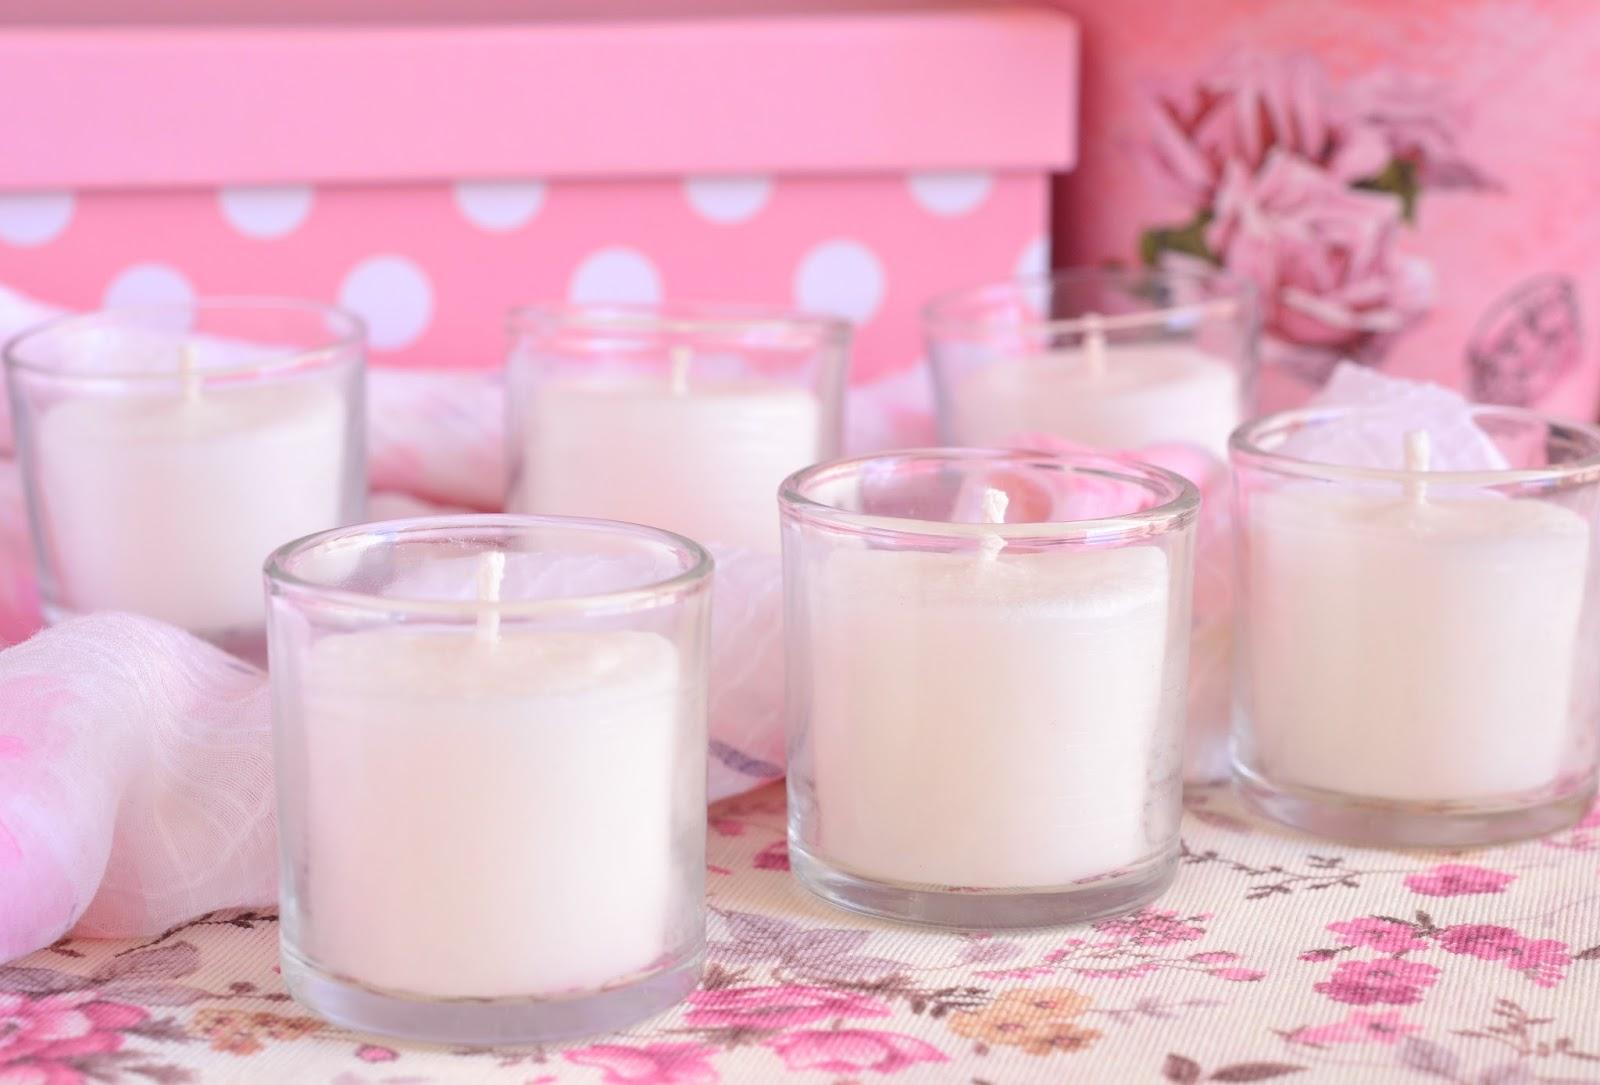 detalles de comunion velas de cera vegetal natural